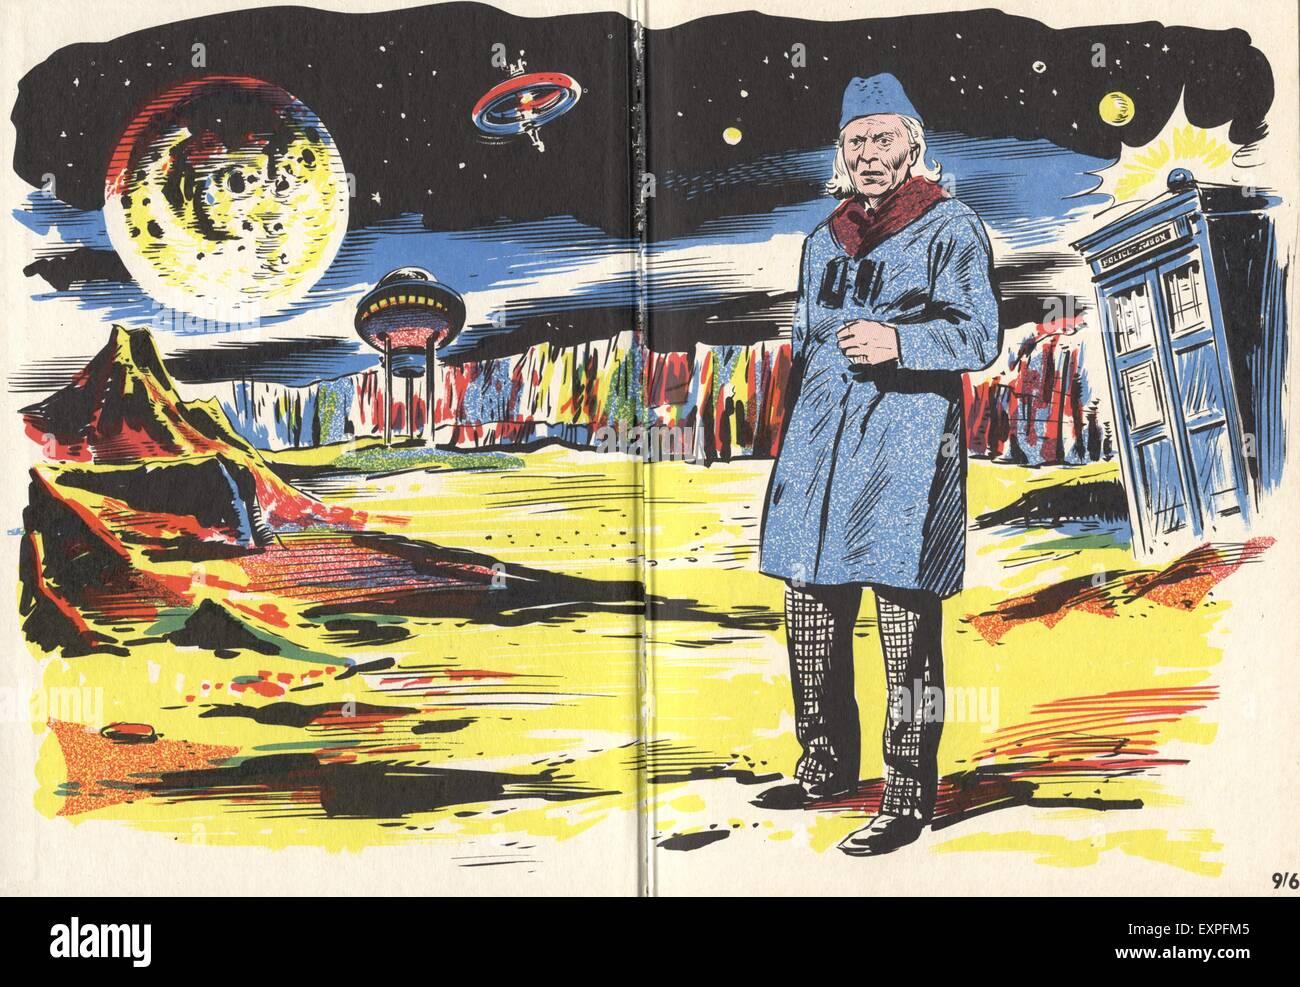 1960s UK Dr Who Comic/ Cartoon Plate - Stock Image